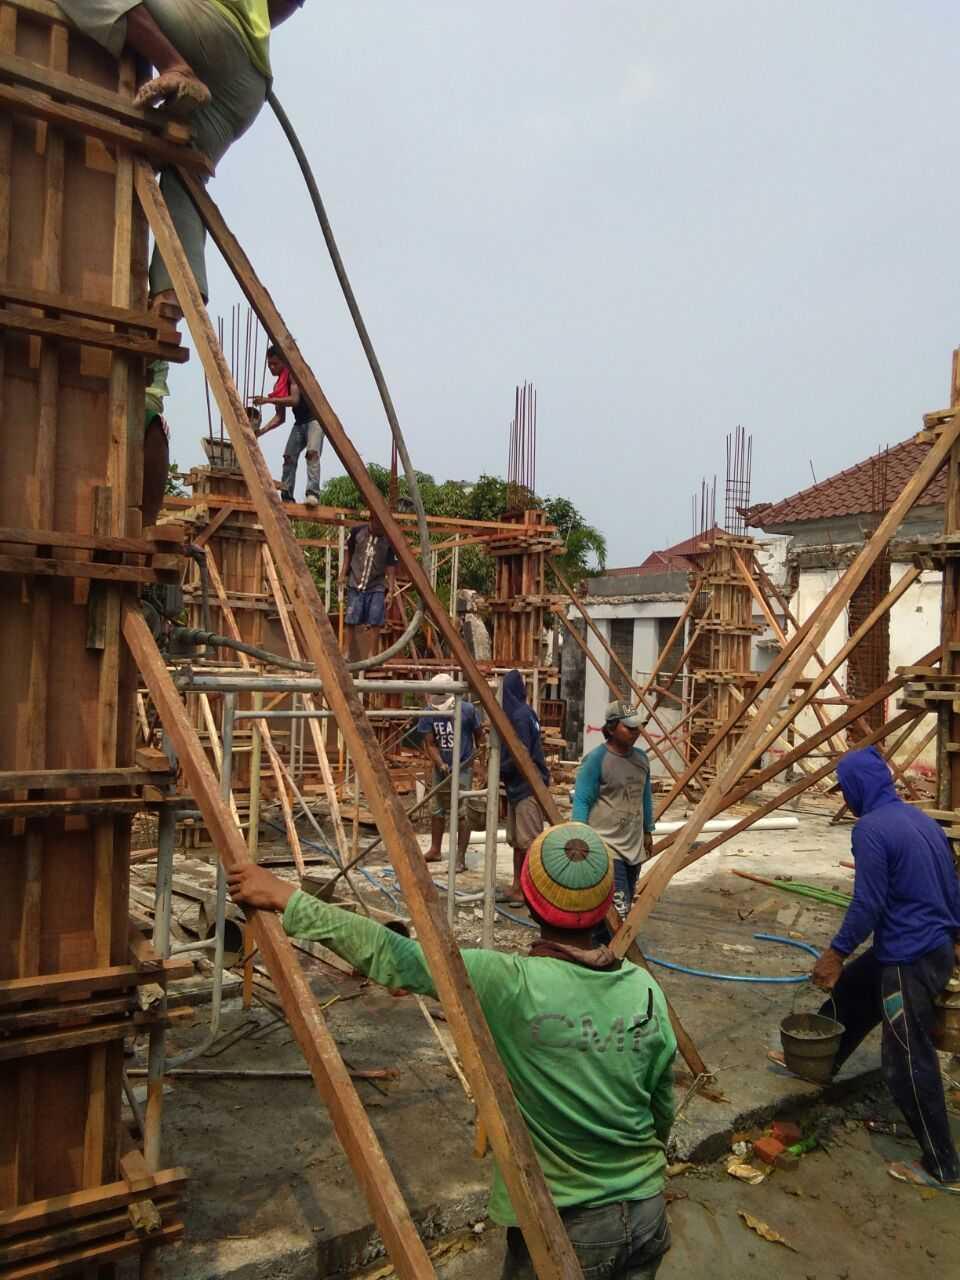 Arbiy Kreasi Rumah Pm Surabaya, Kota Sby, Jawa Timur, Indonesia Surabaya, Kota Sby, Jawa Timur, Indonesia Arbiy-Kreasi-Rumah-Pm   111197